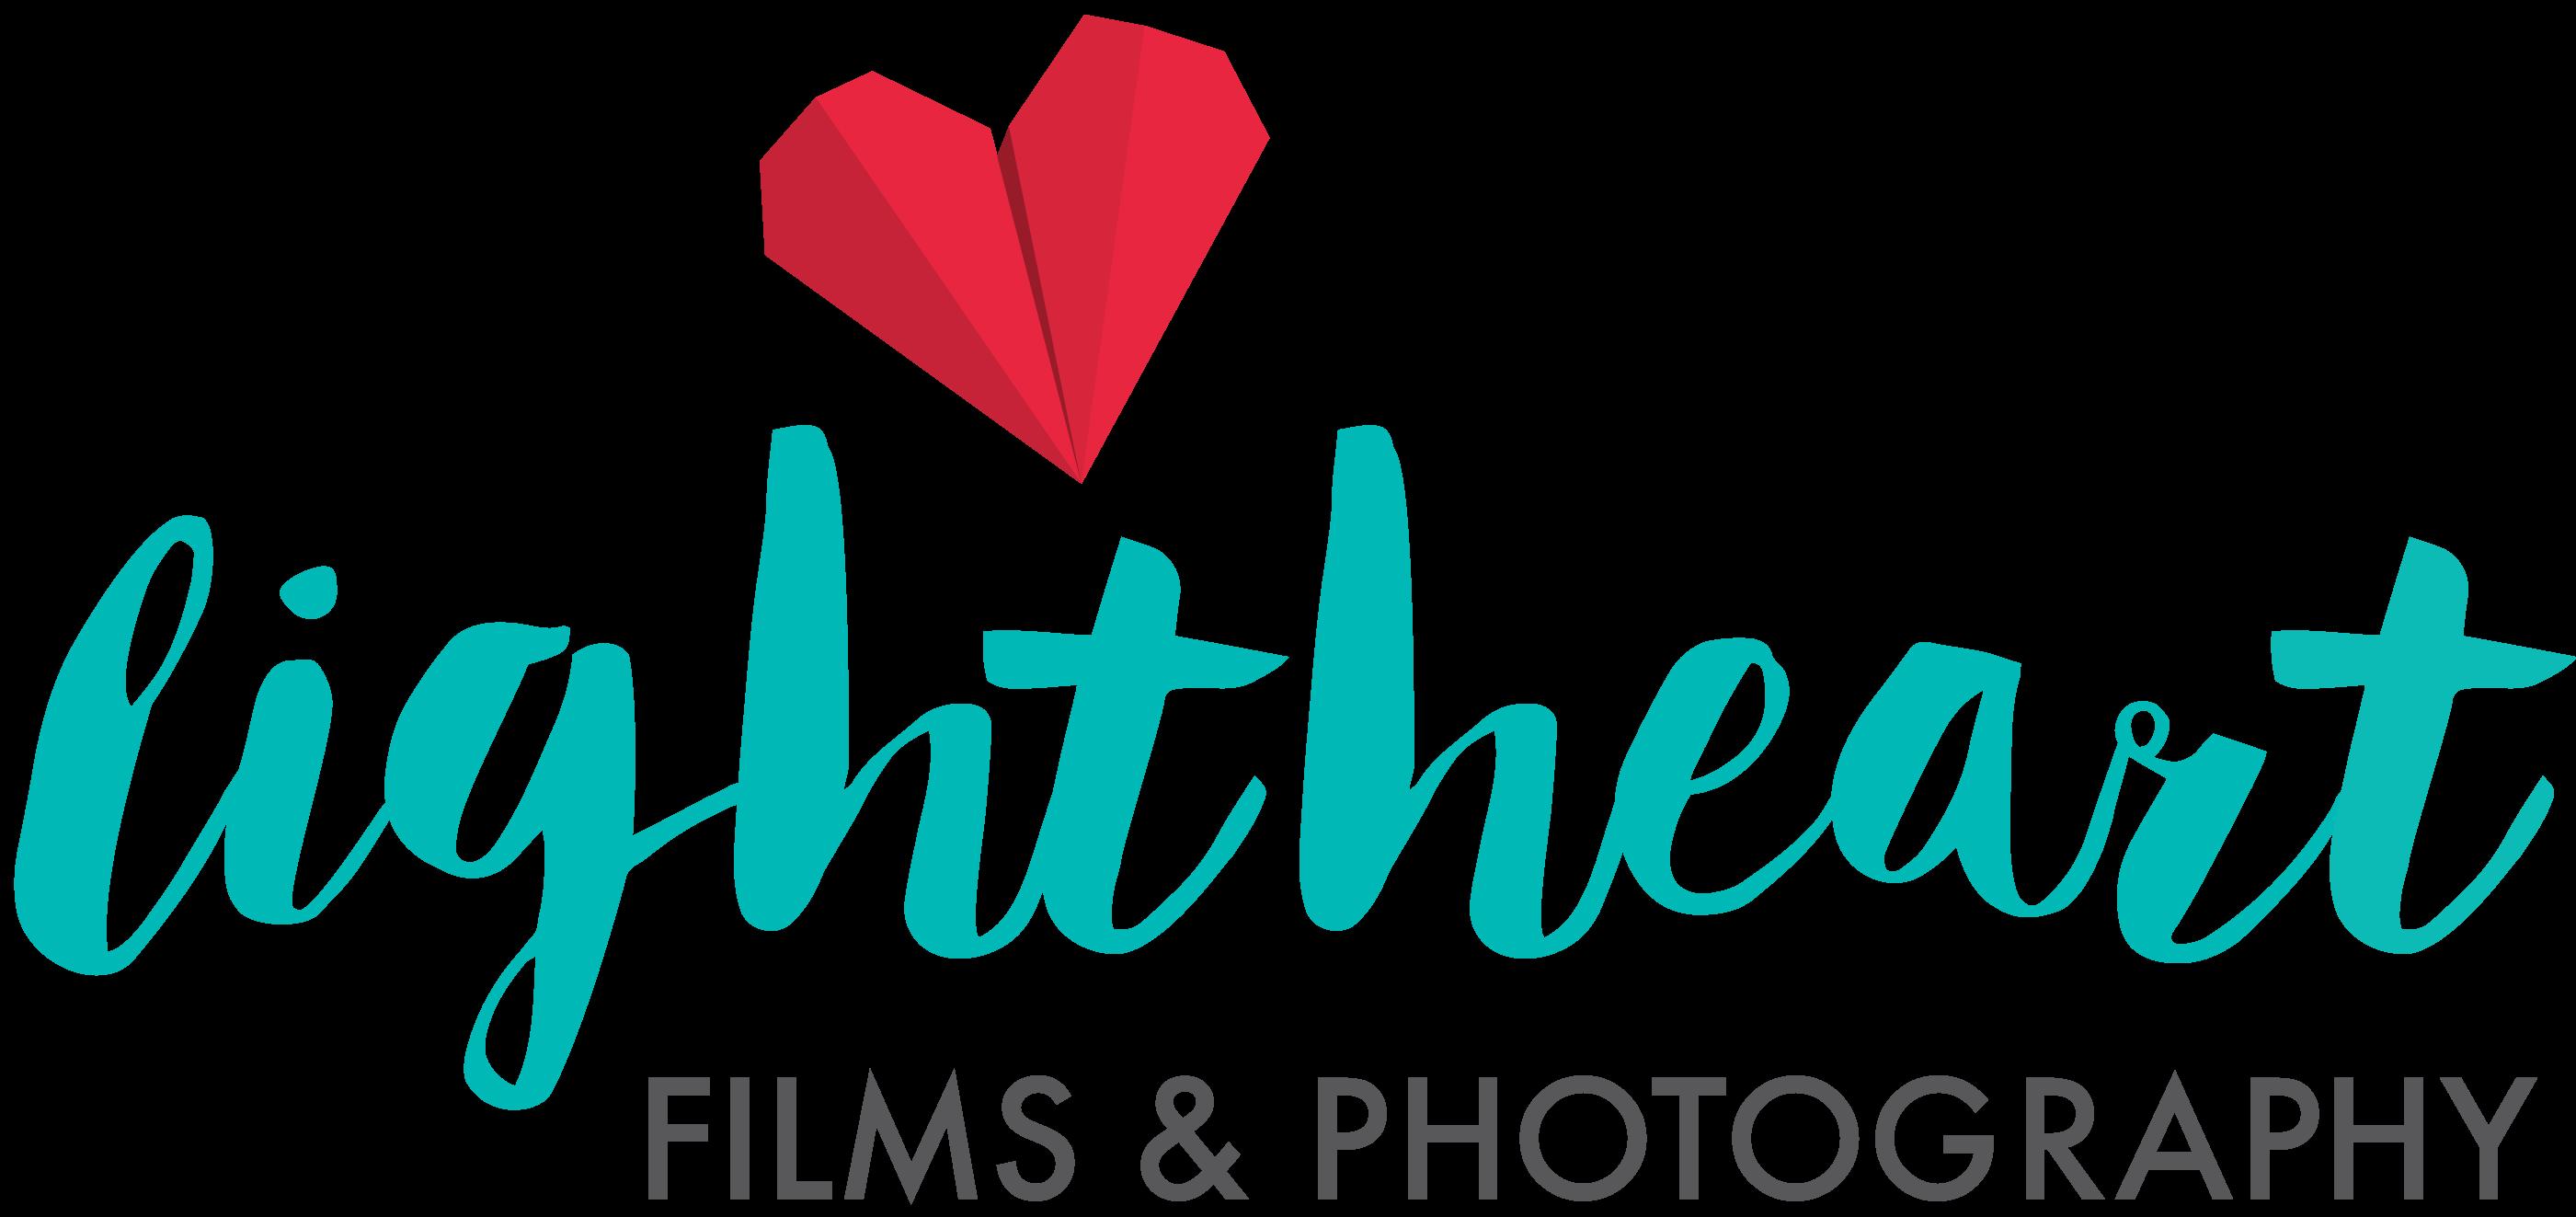 Lightheart Wedding Films & Photograhy Sydney